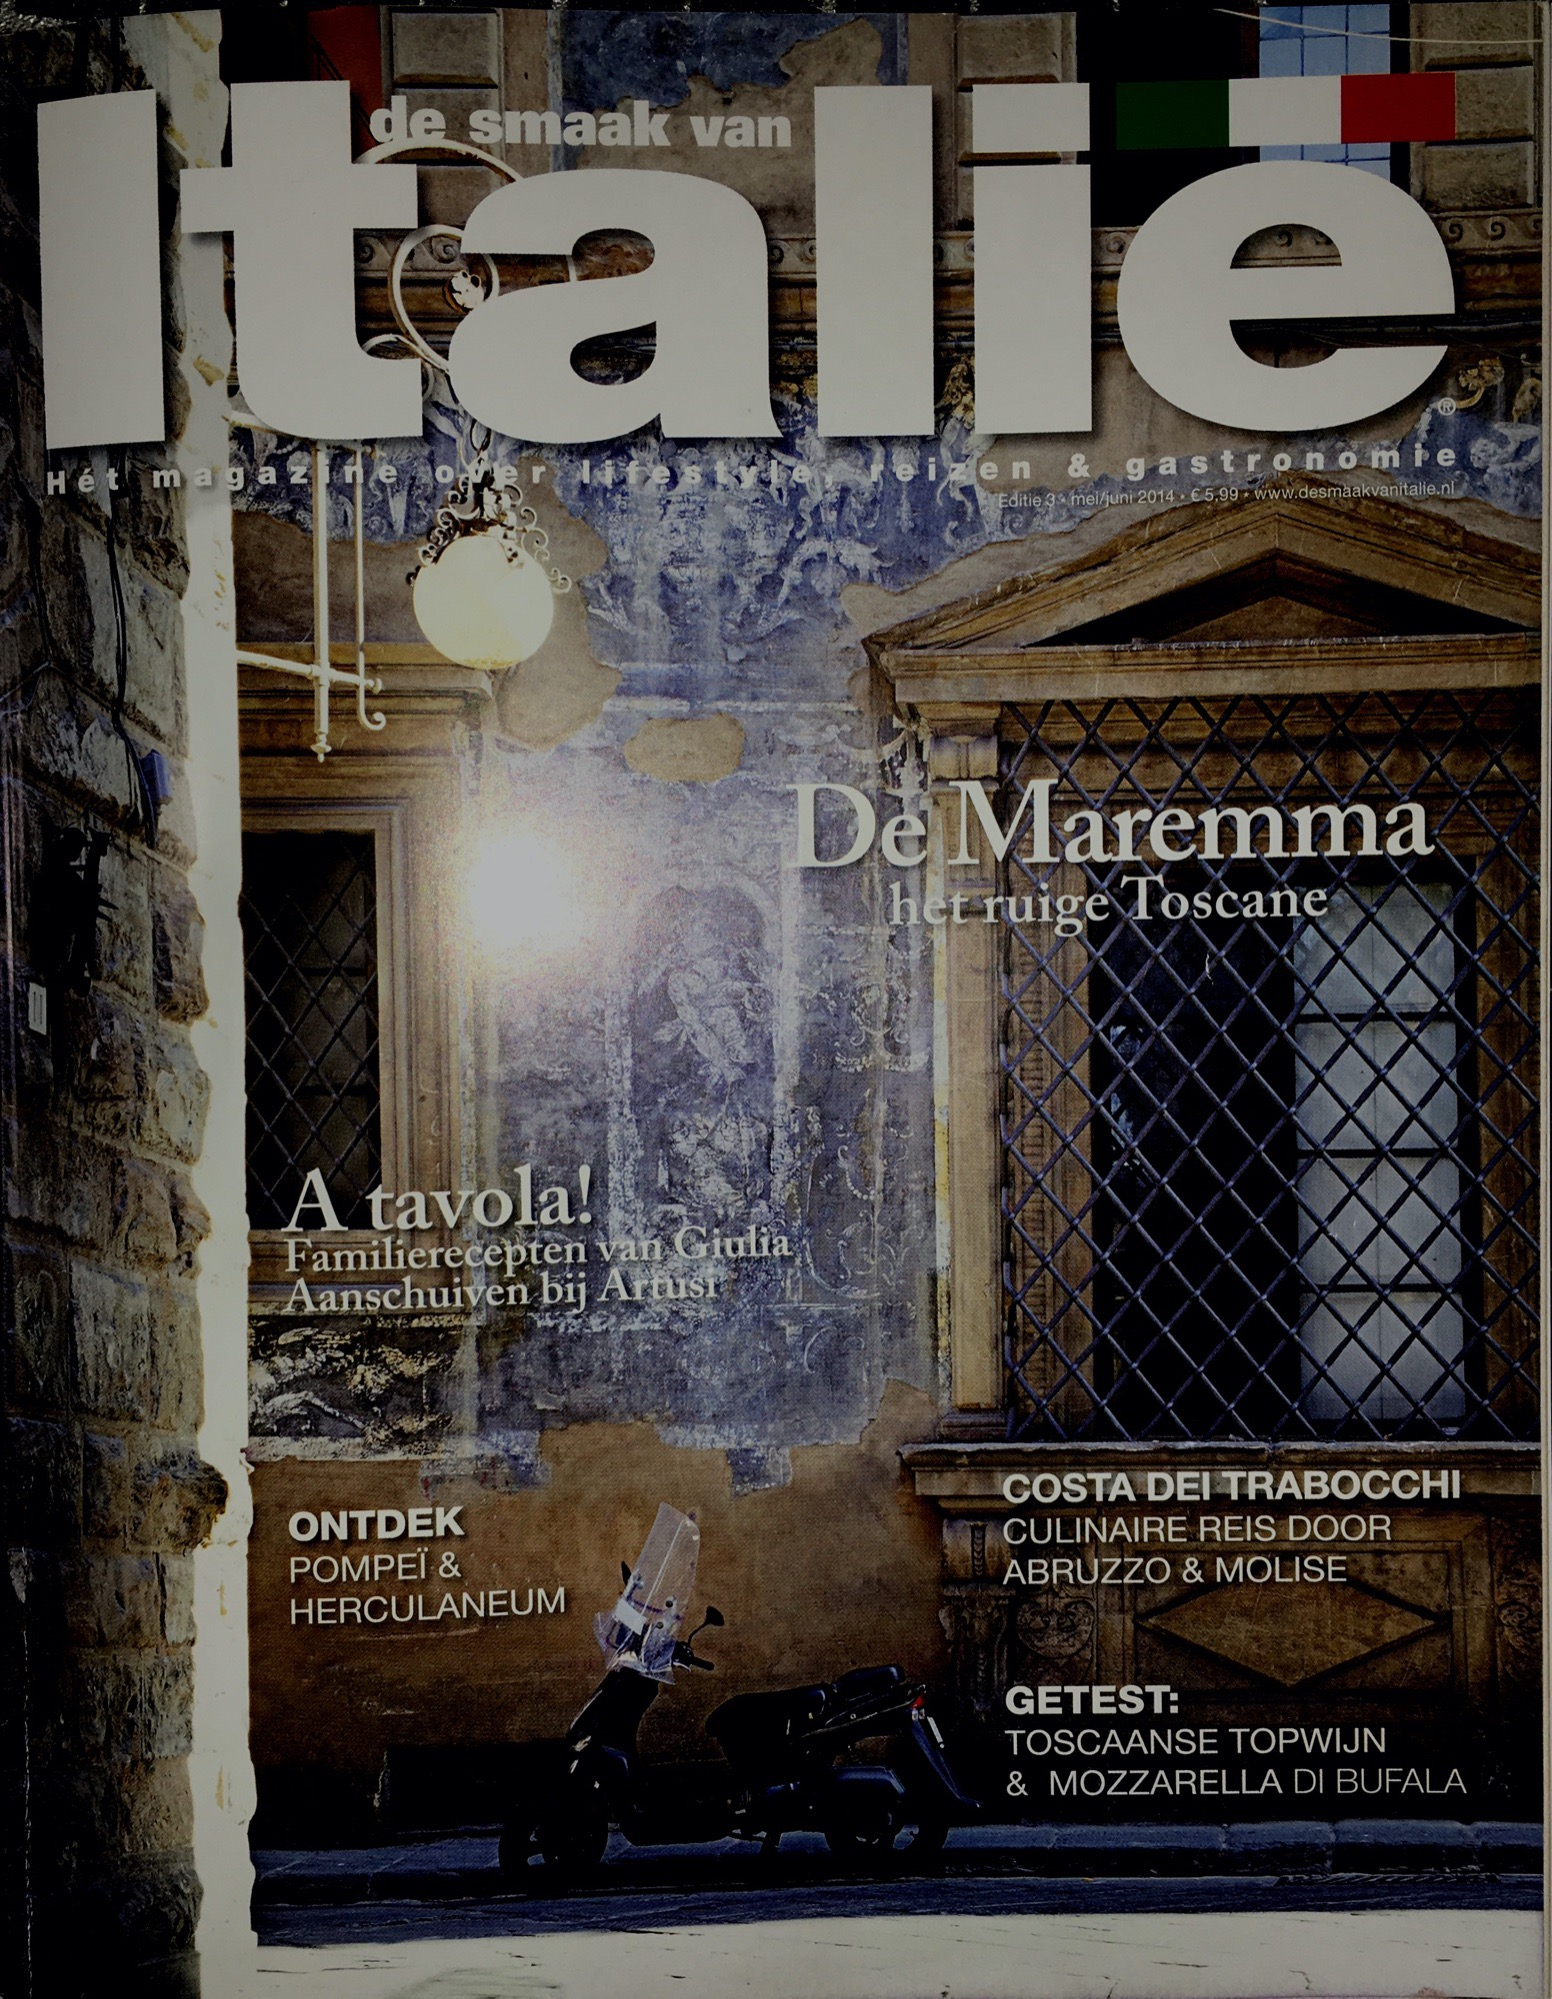 Italie.....Hèt magazine